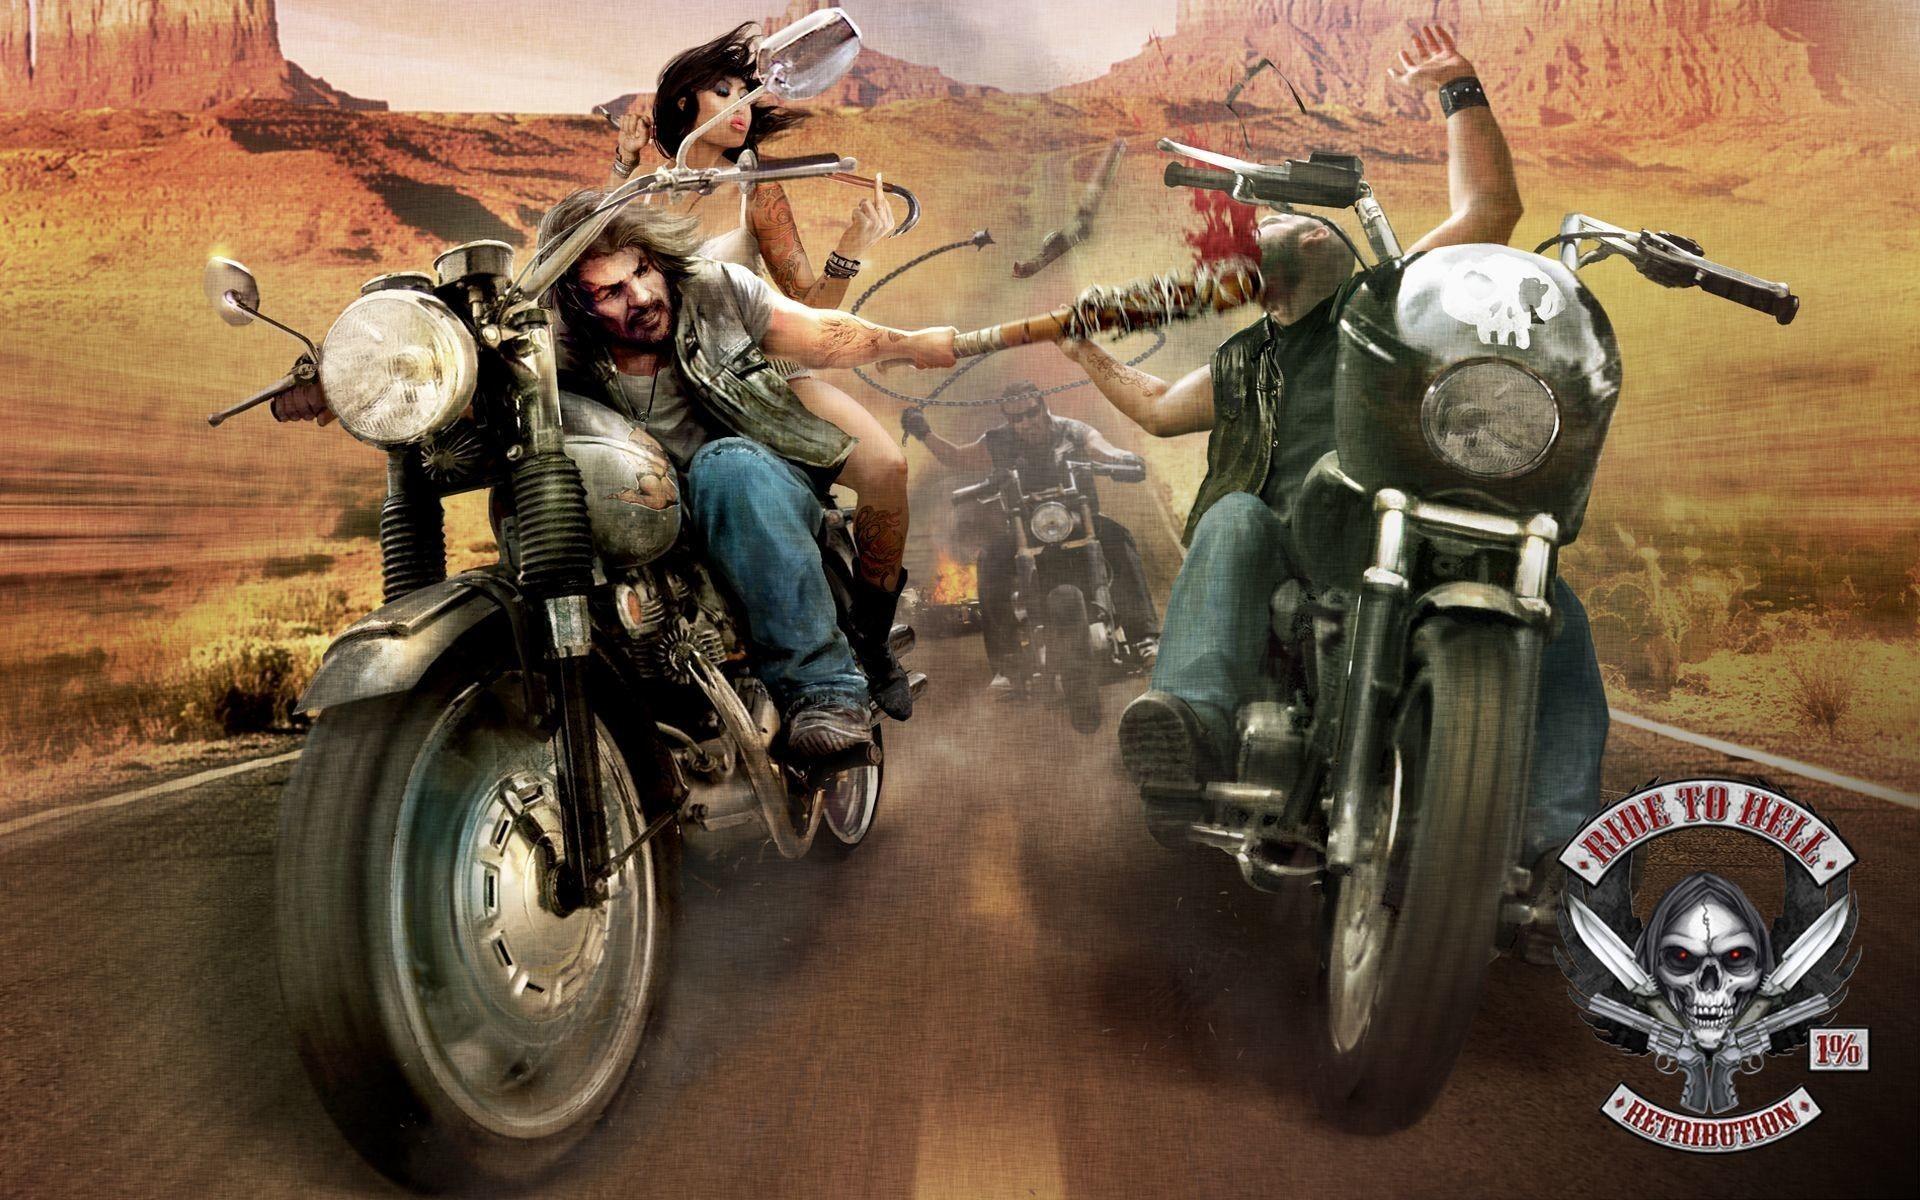 Res: 1920x1200, Outlaw Biker Wallpaper 61+ - xshyfc.com